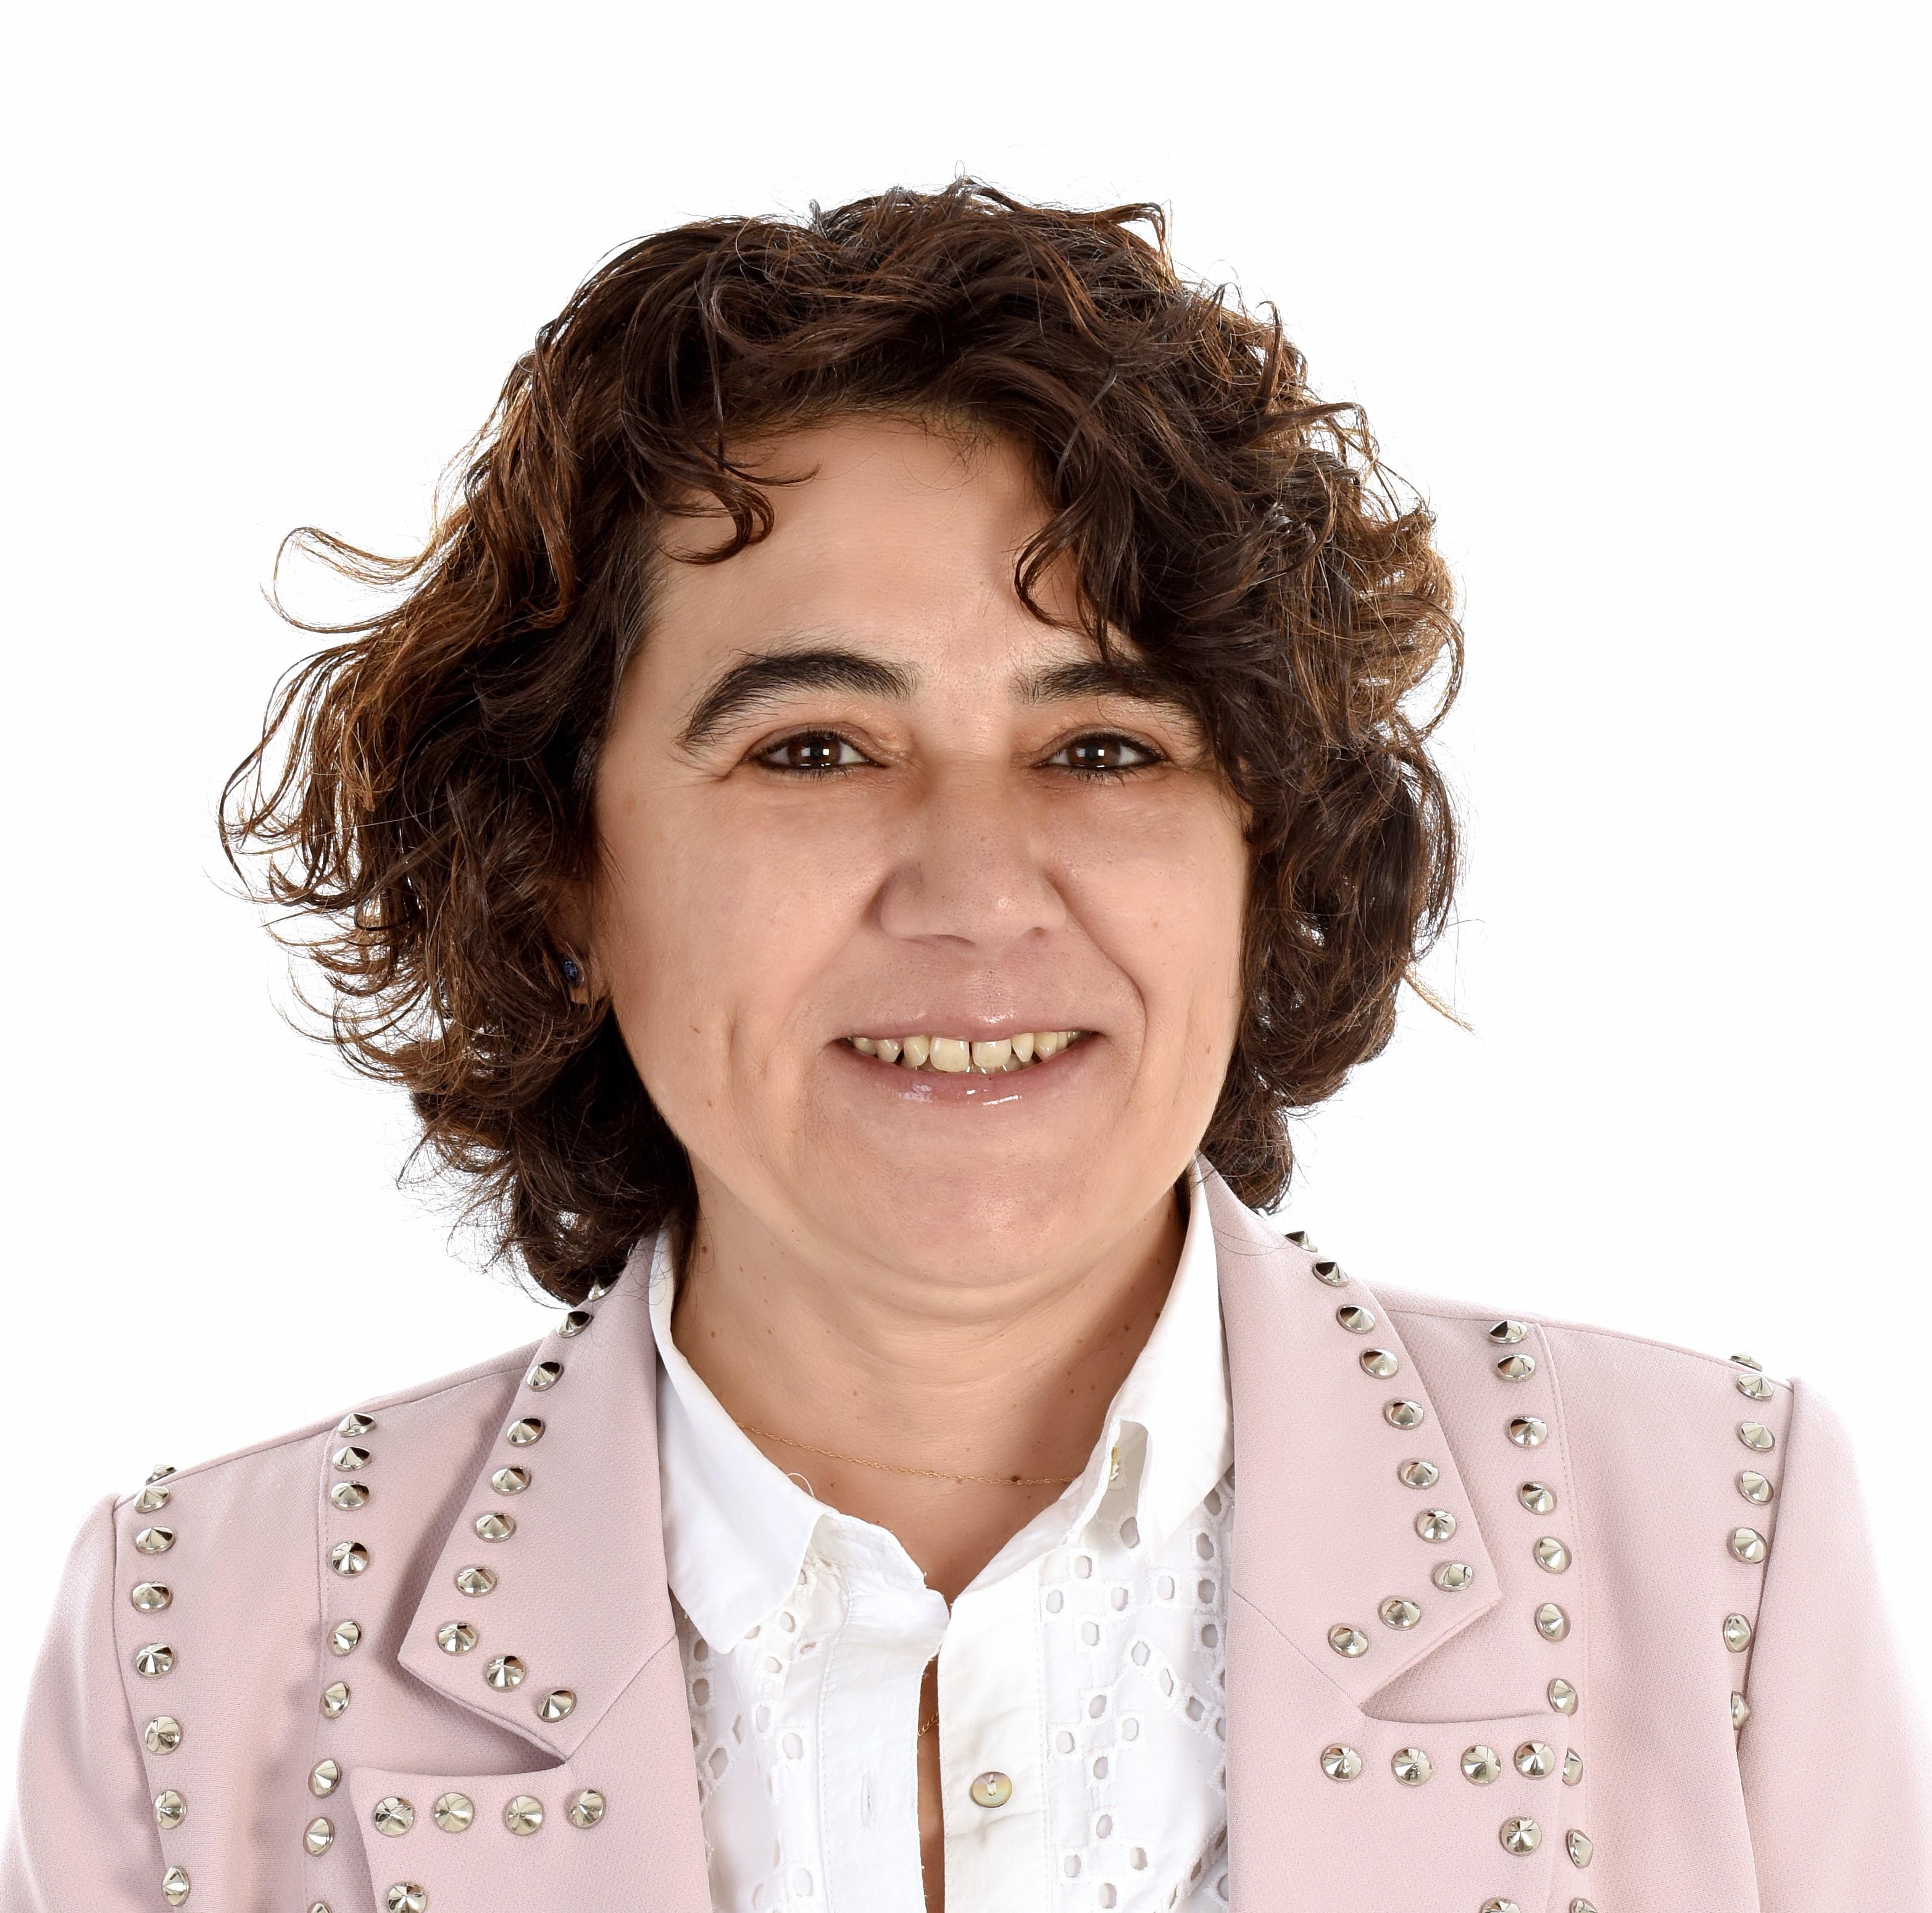 Belén Gonzalez-Gay Mantecón